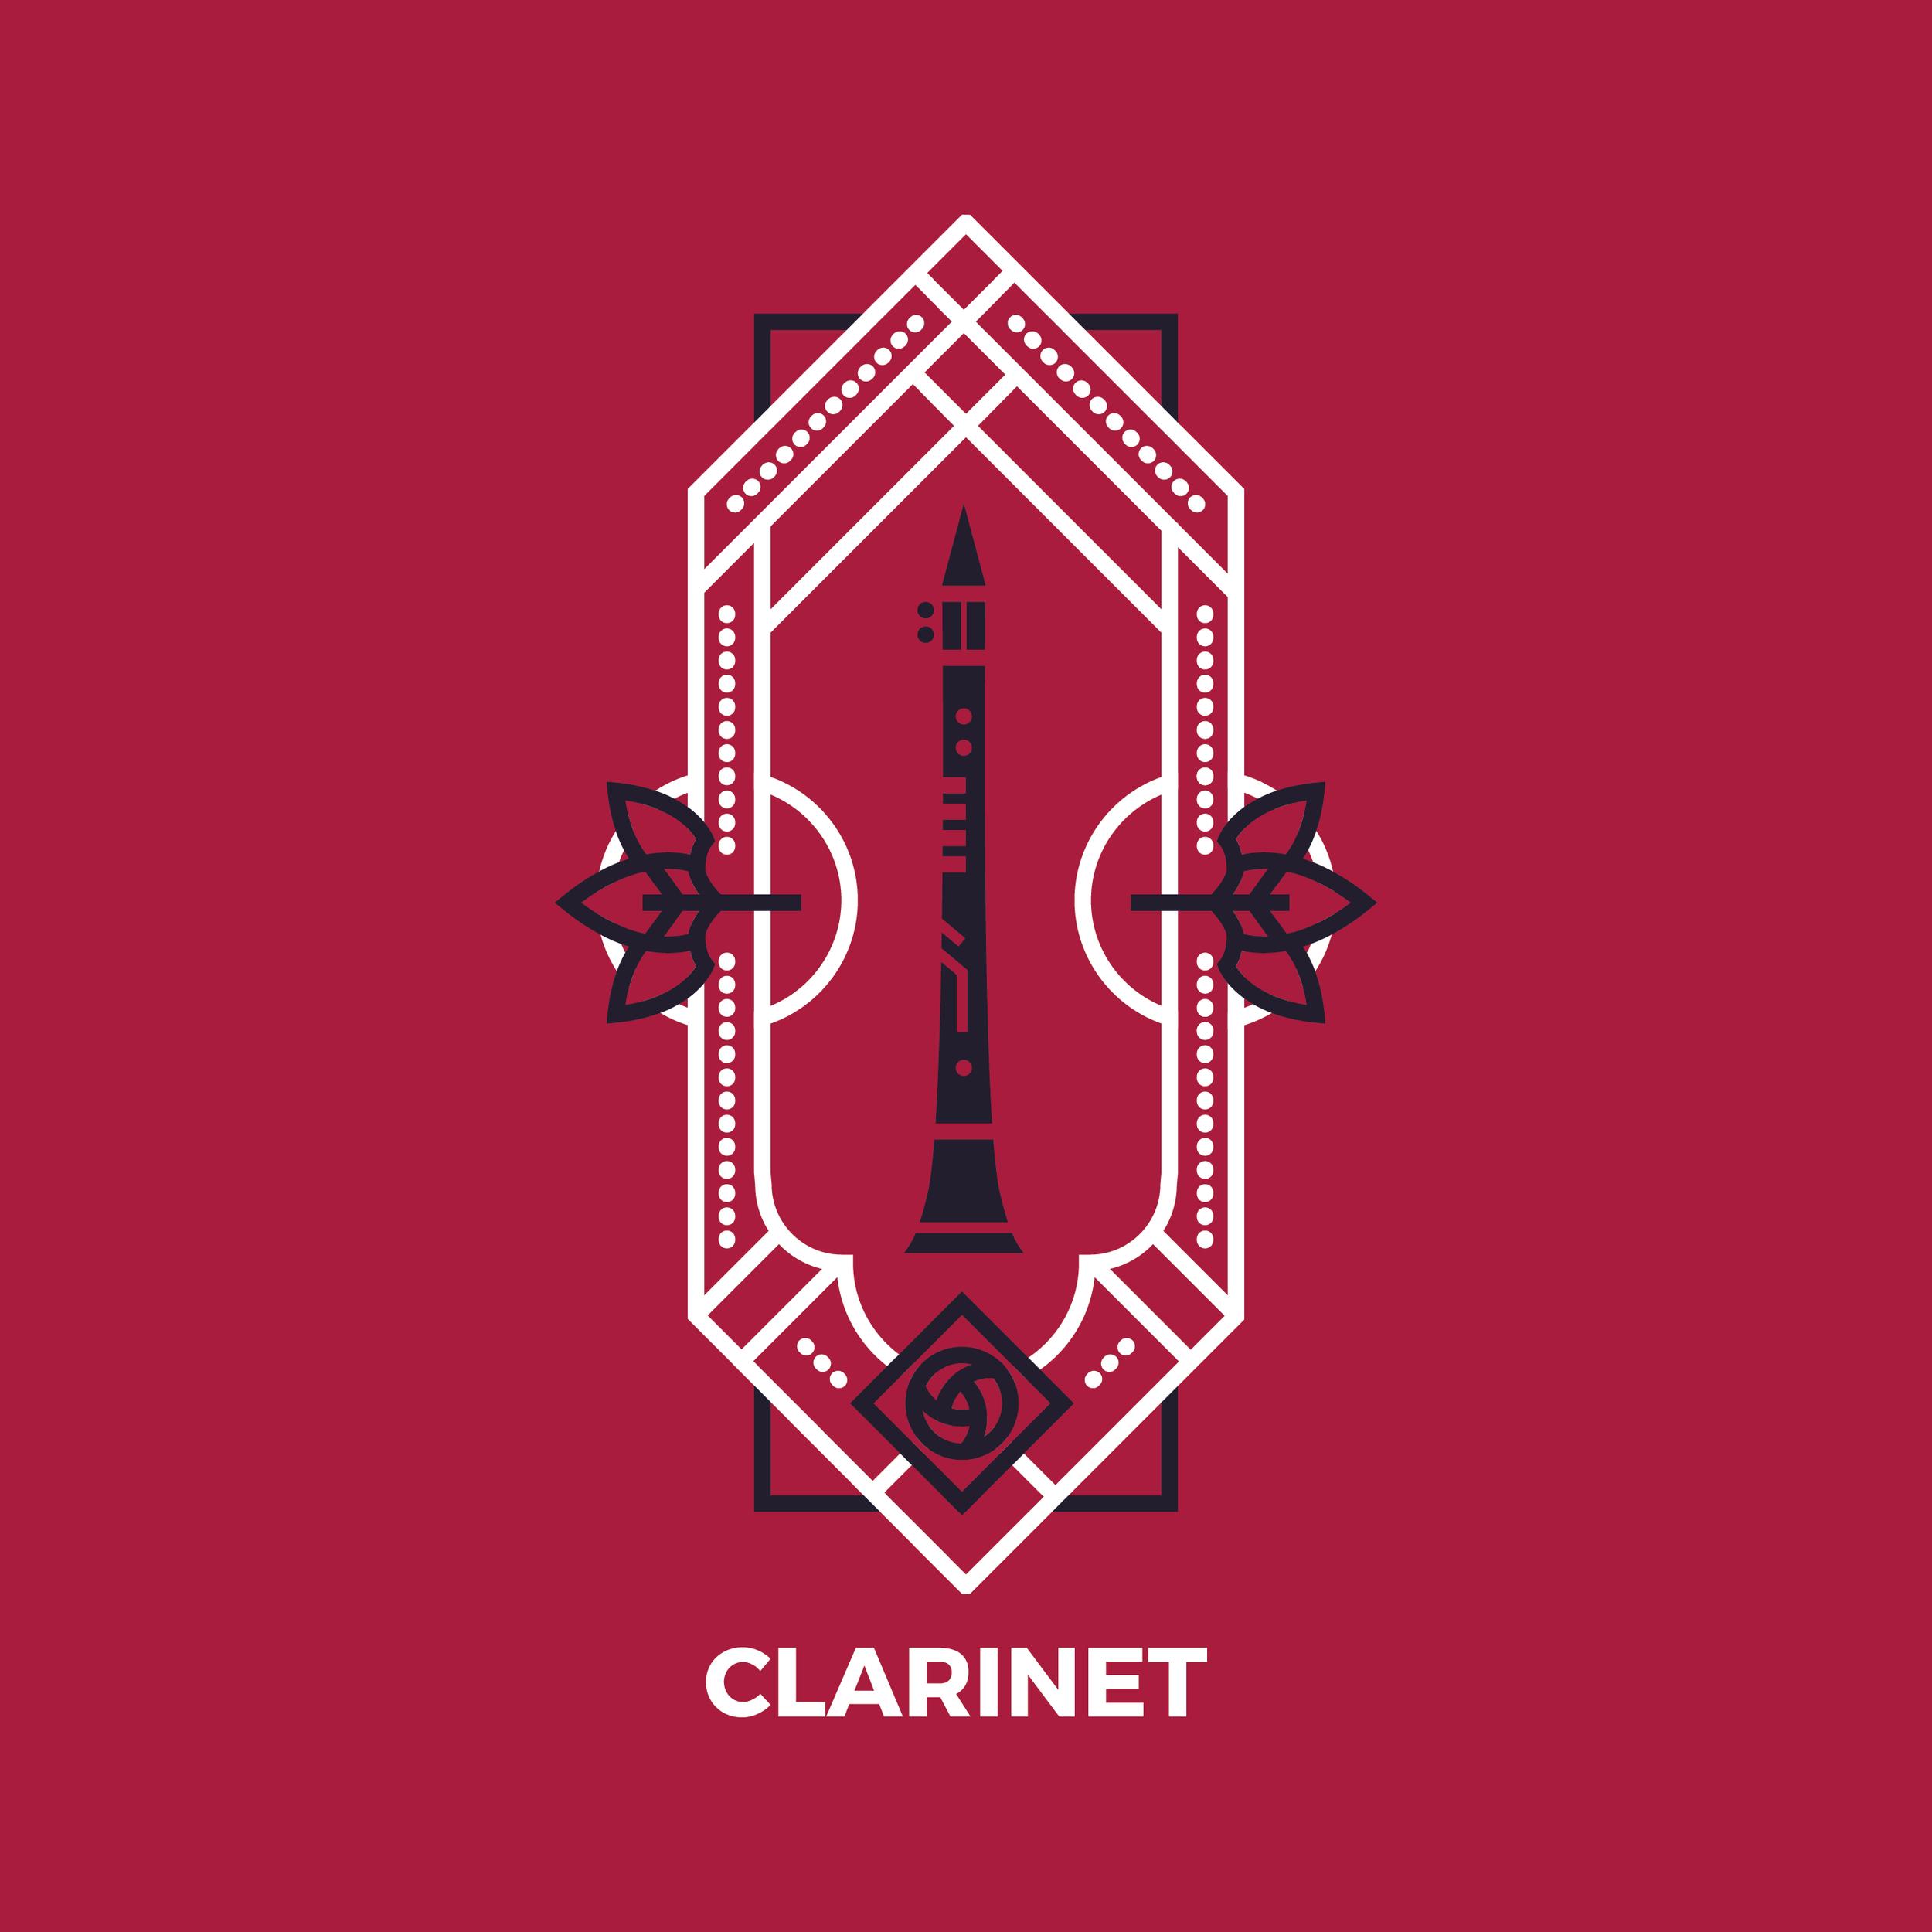 Clarintet-01.png